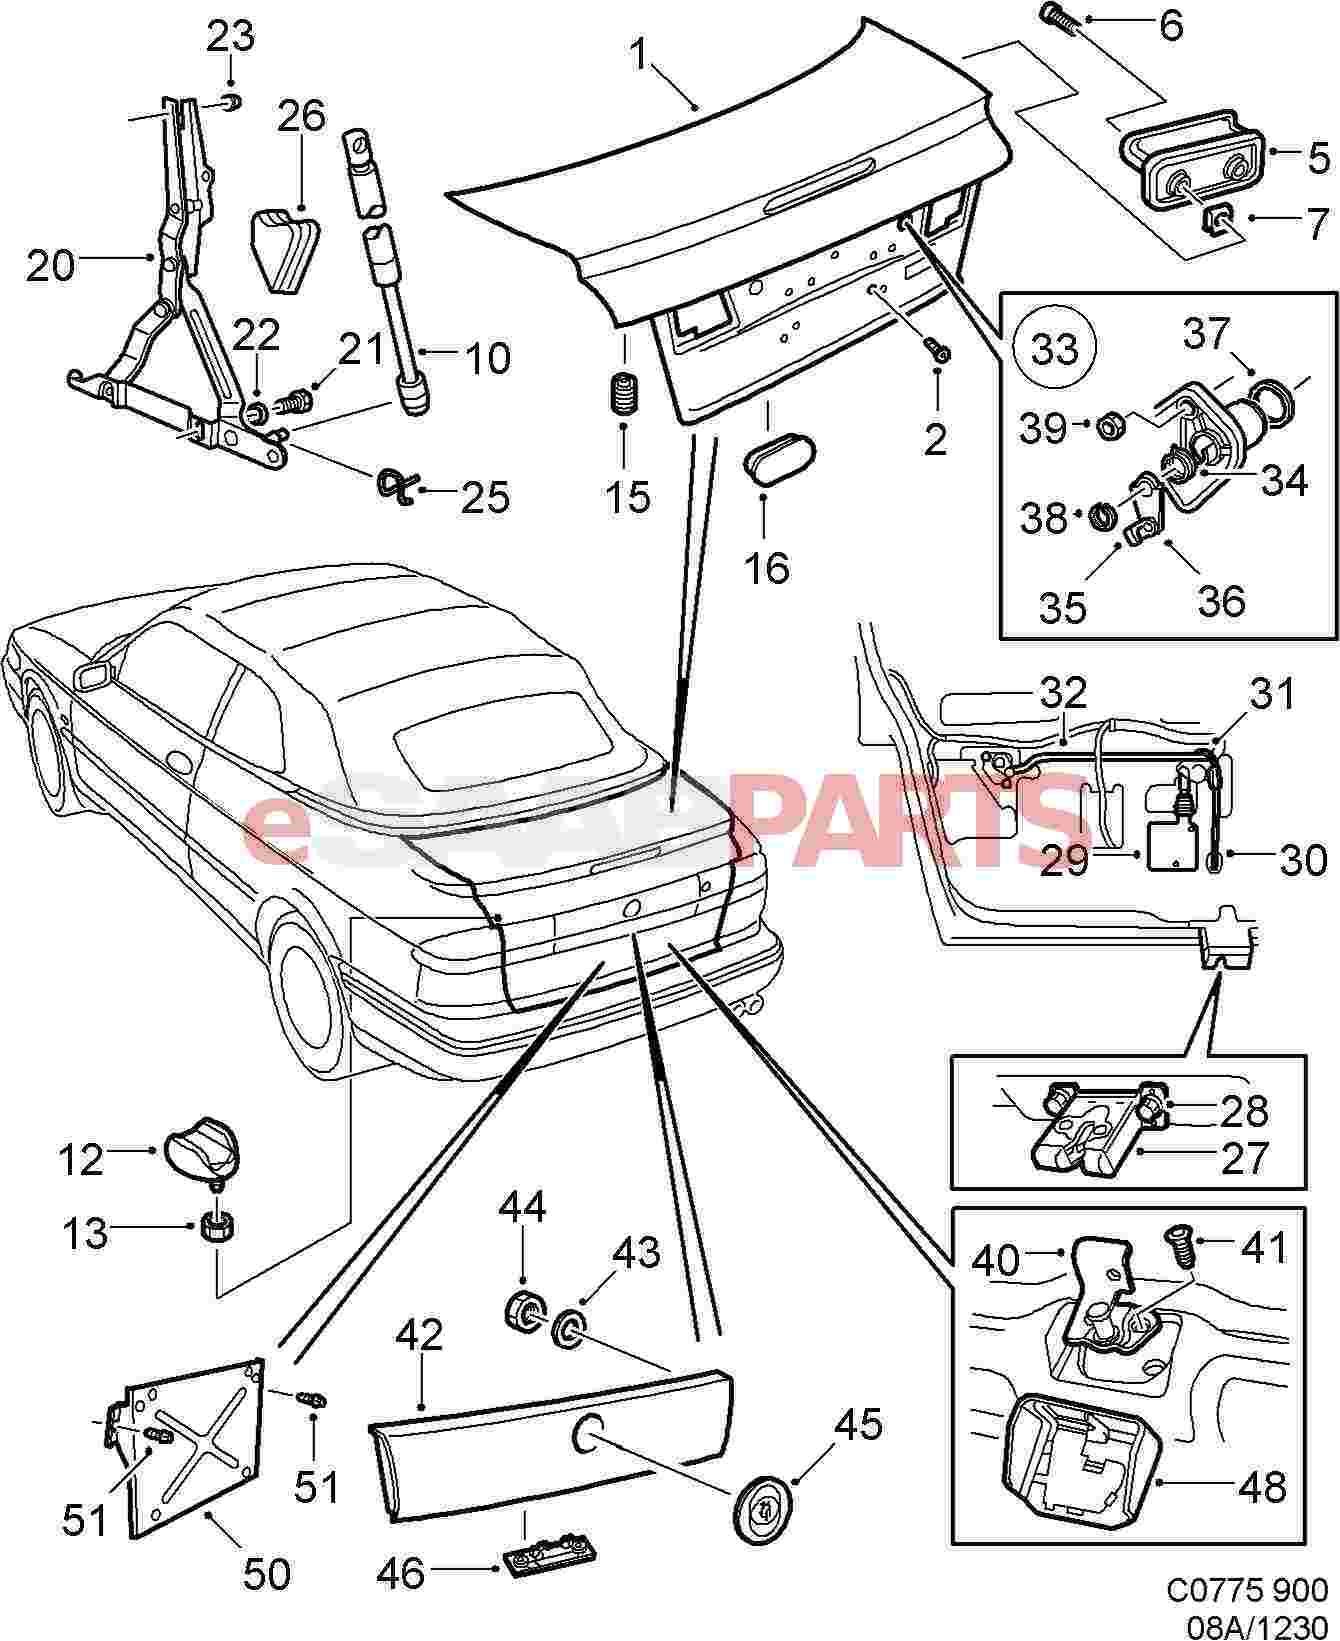 Esaabparts saab 900 > car body external parts > trunk related > trunk lid lock